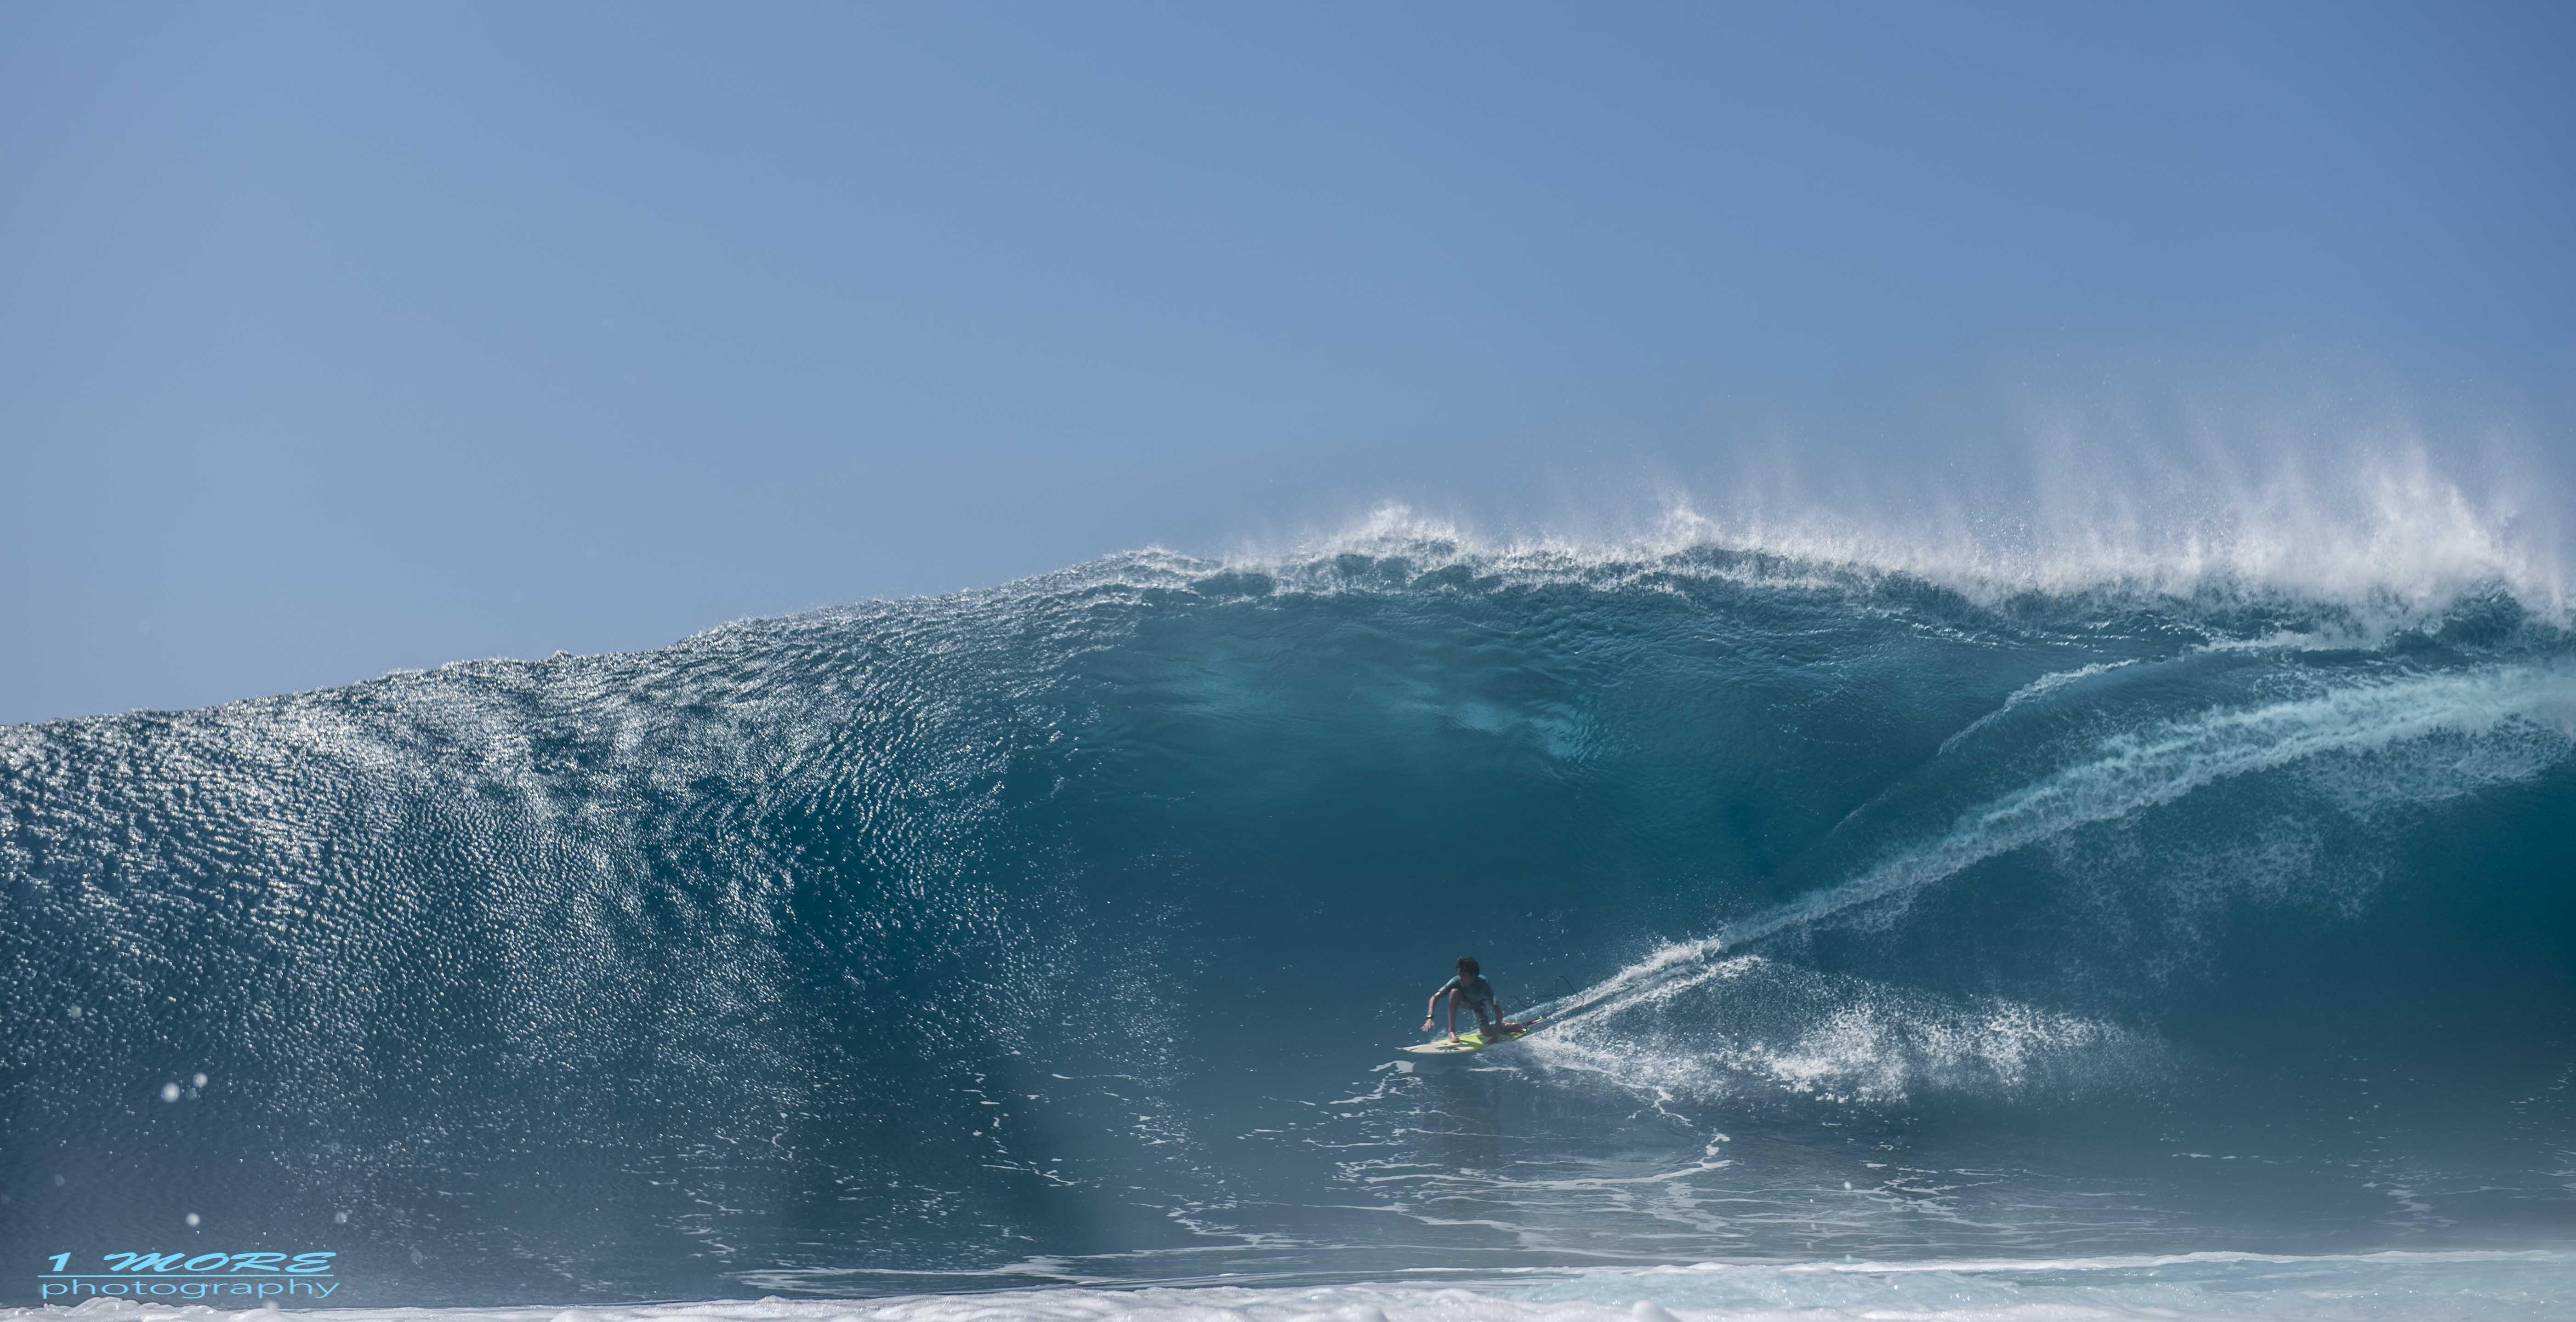 Jackson on a massive wave at Honolua Bay Photo: 1morephotography